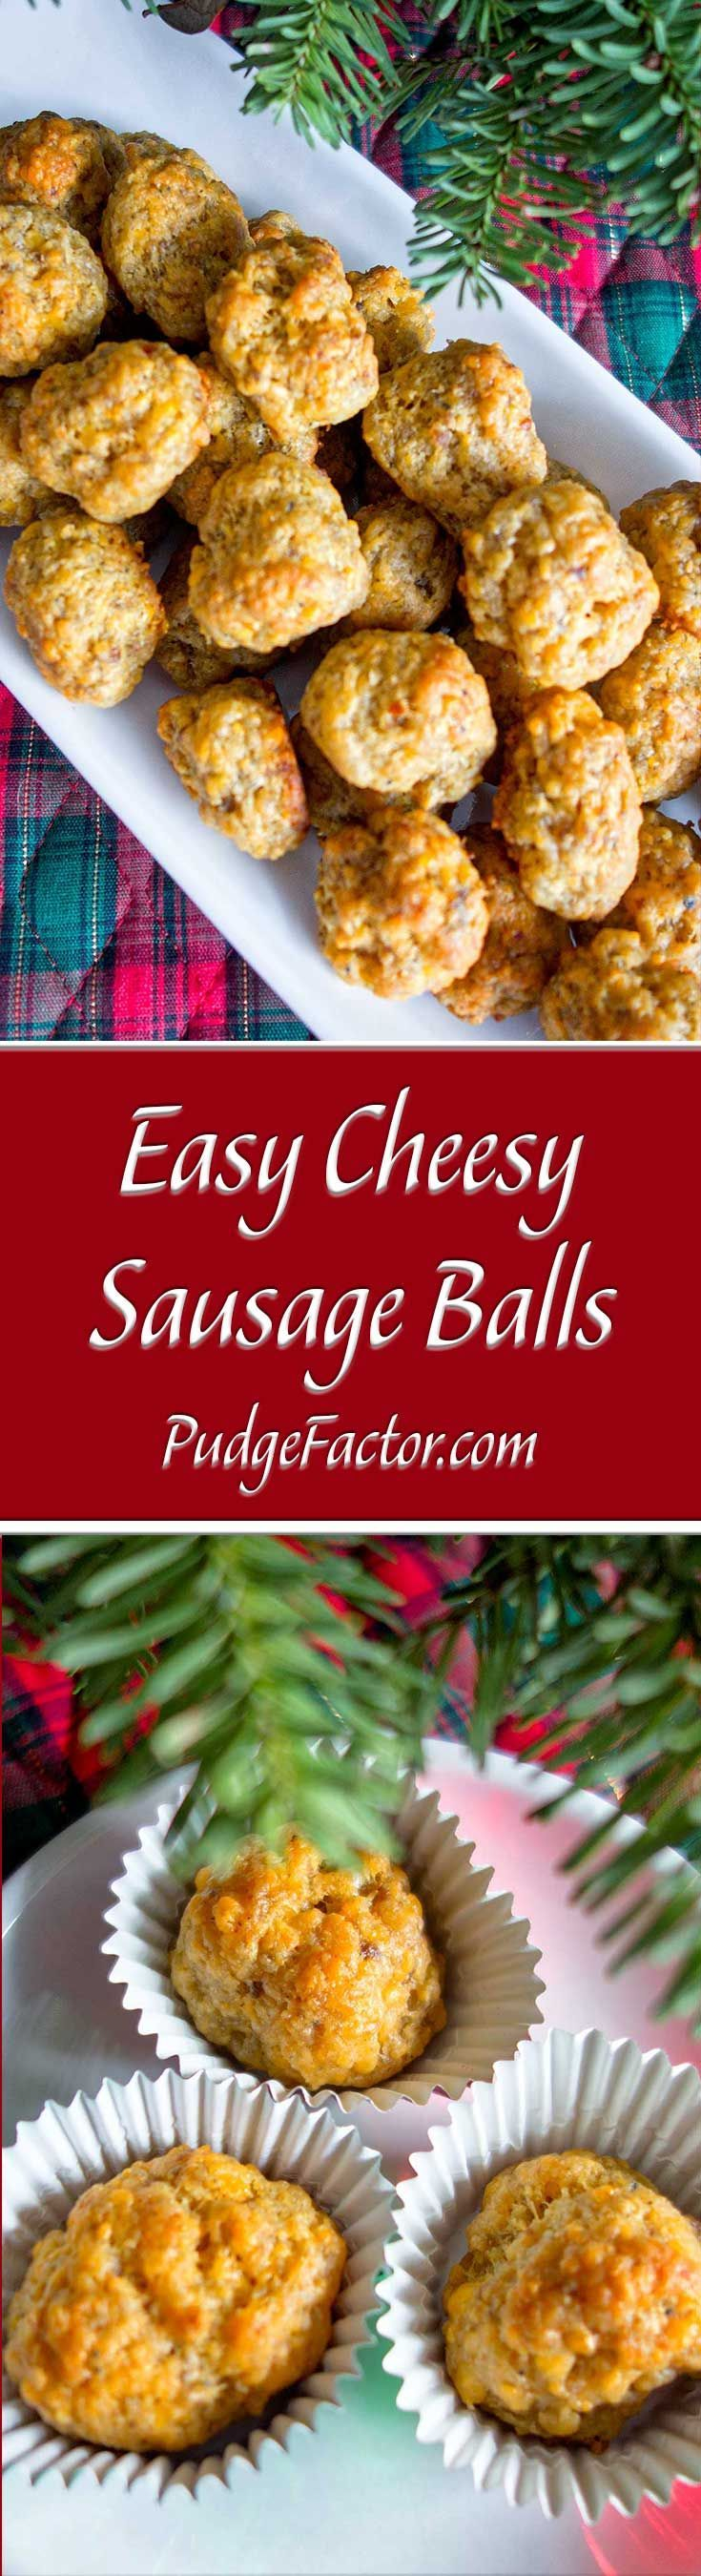 Easy Cheesy Sausage Balls #sausageballs